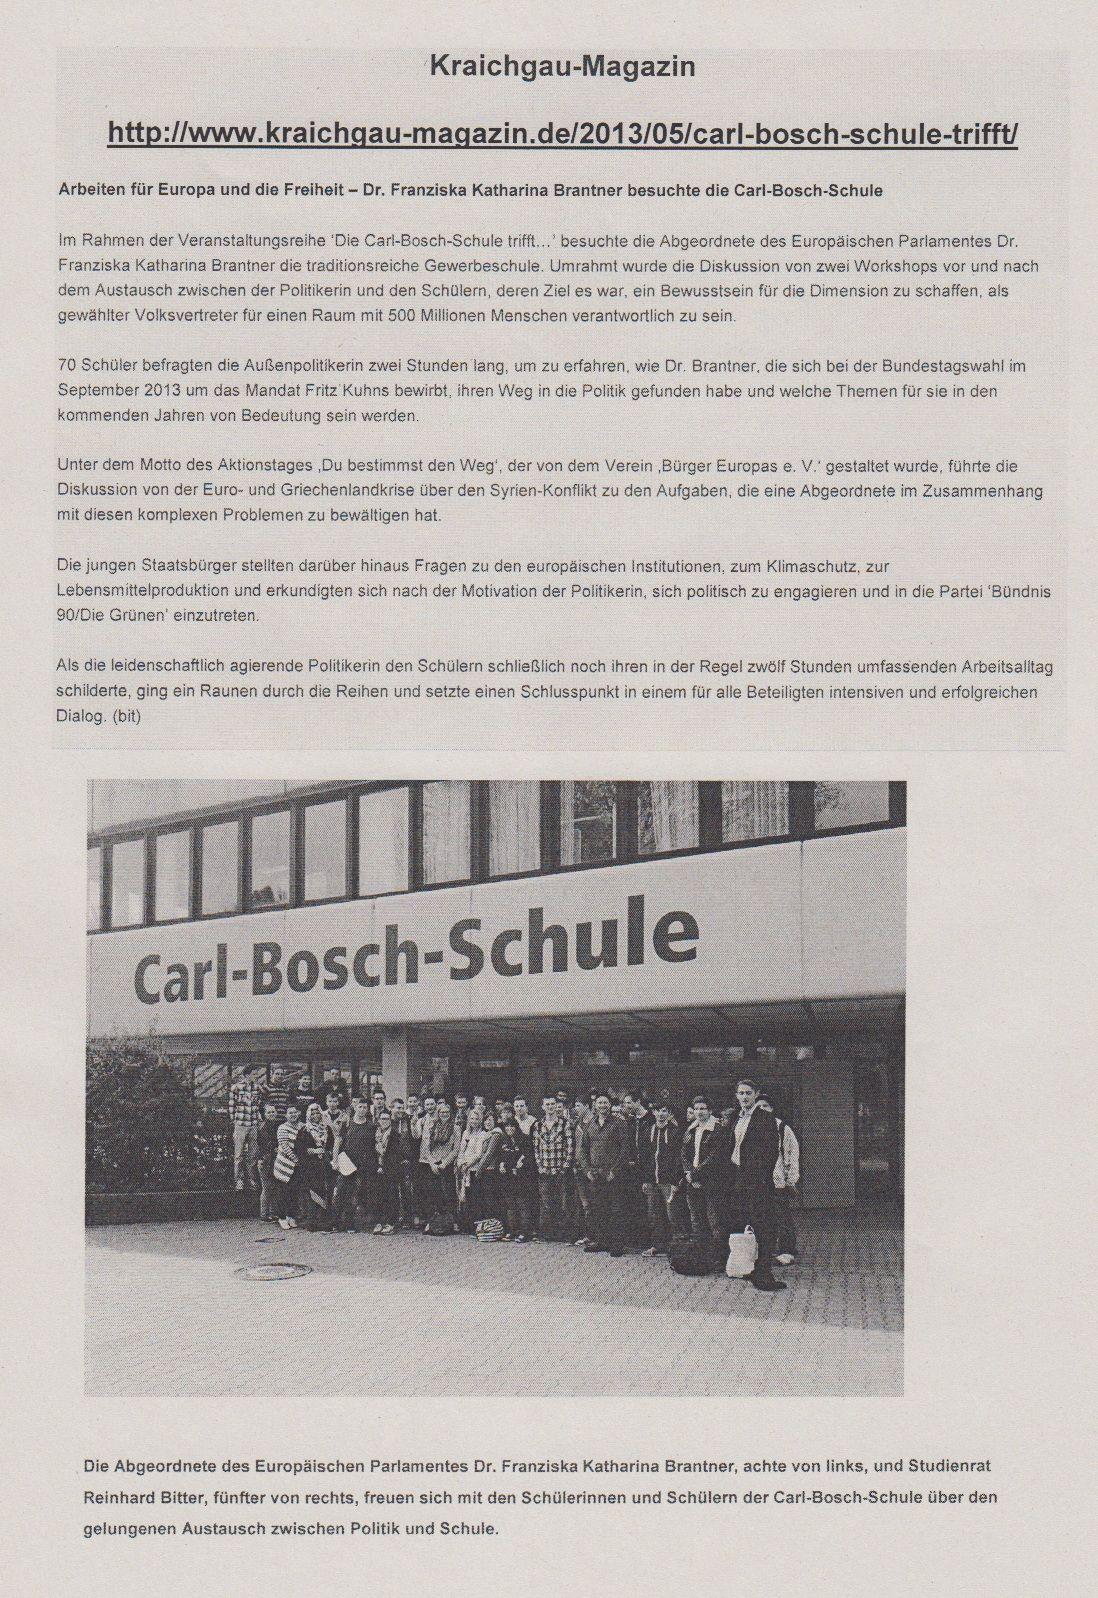 Großzügig Freiheit Universitätsdiplom Rahmen Ideen - Bilderrahmen ...